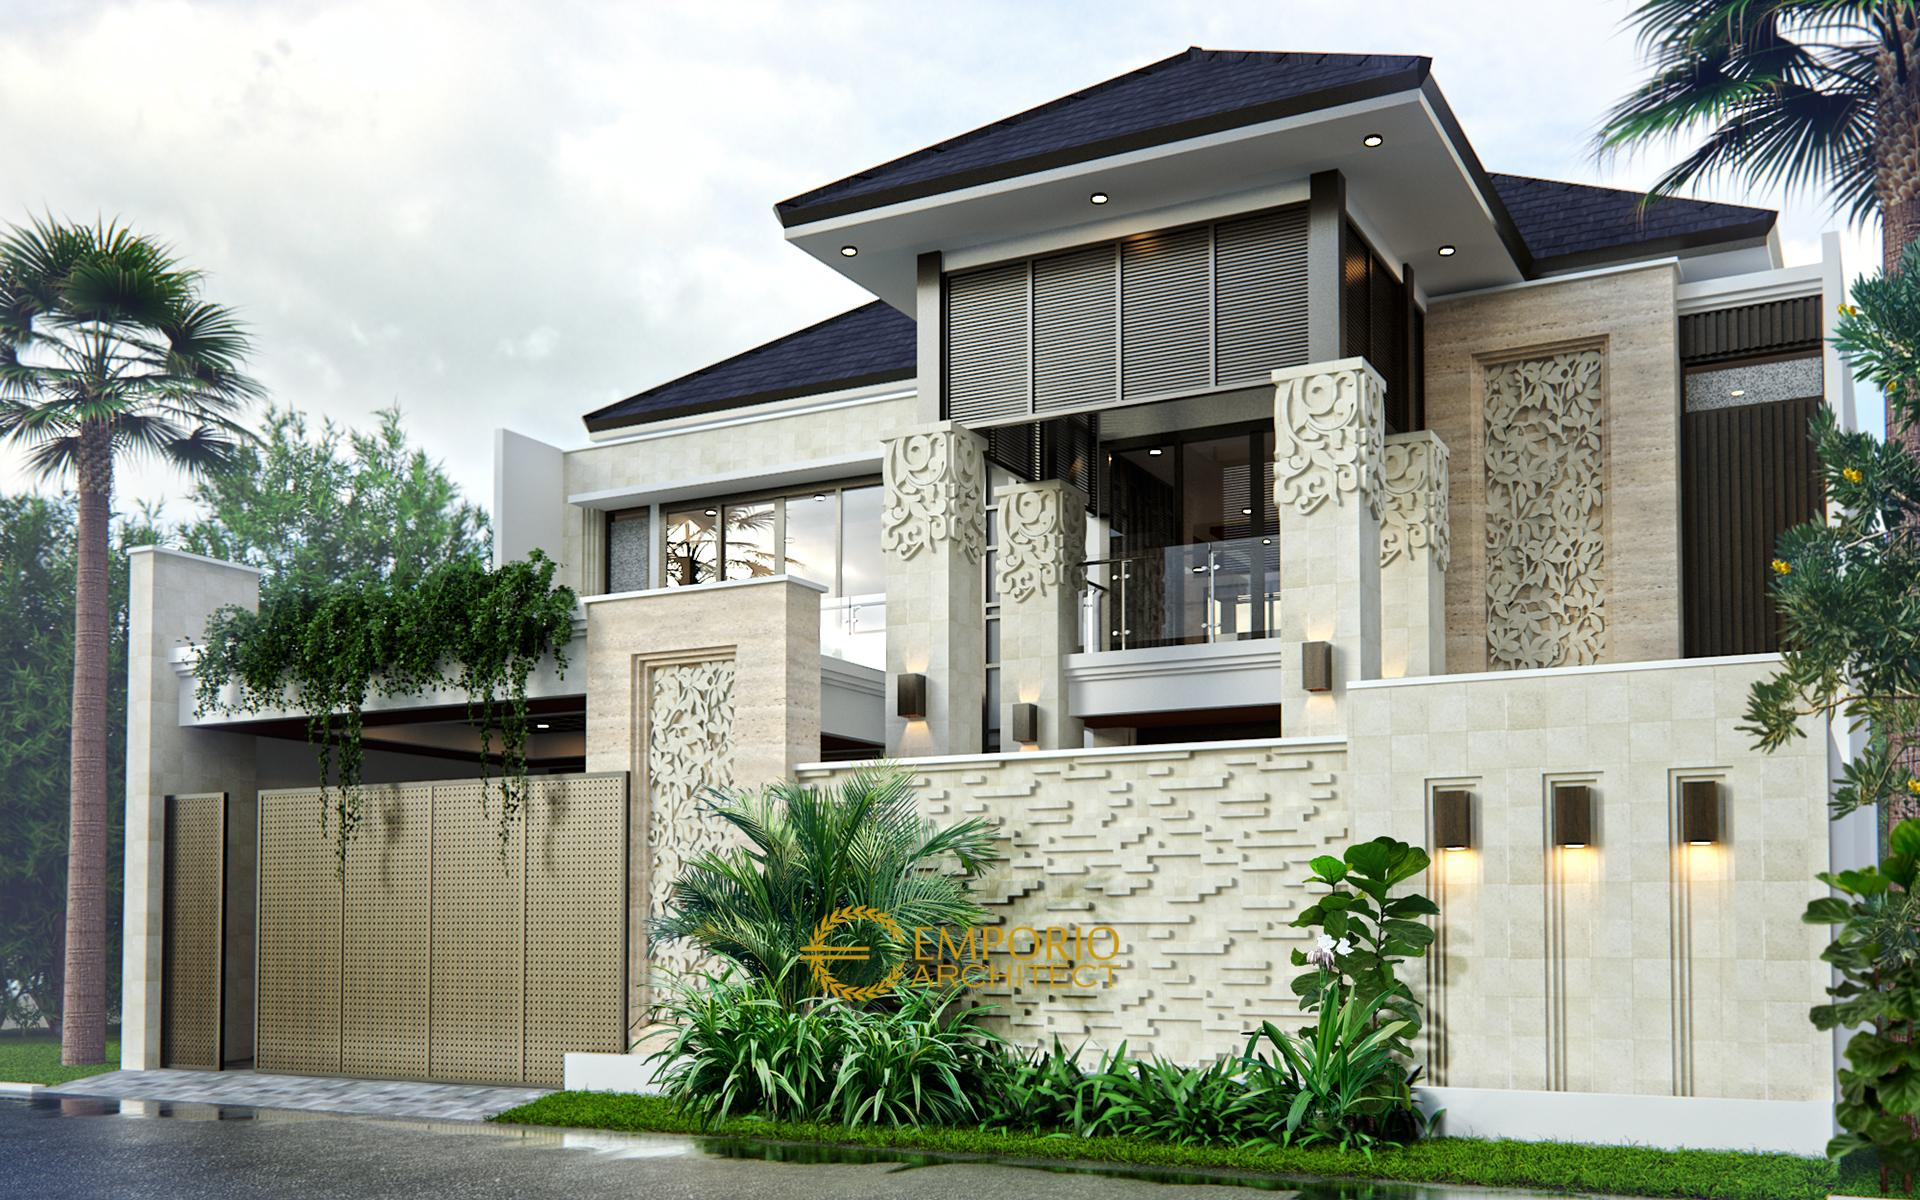 Mr. Edmon Villa Bali House 2 Floors Design - Cibubur, Jakarta Timur